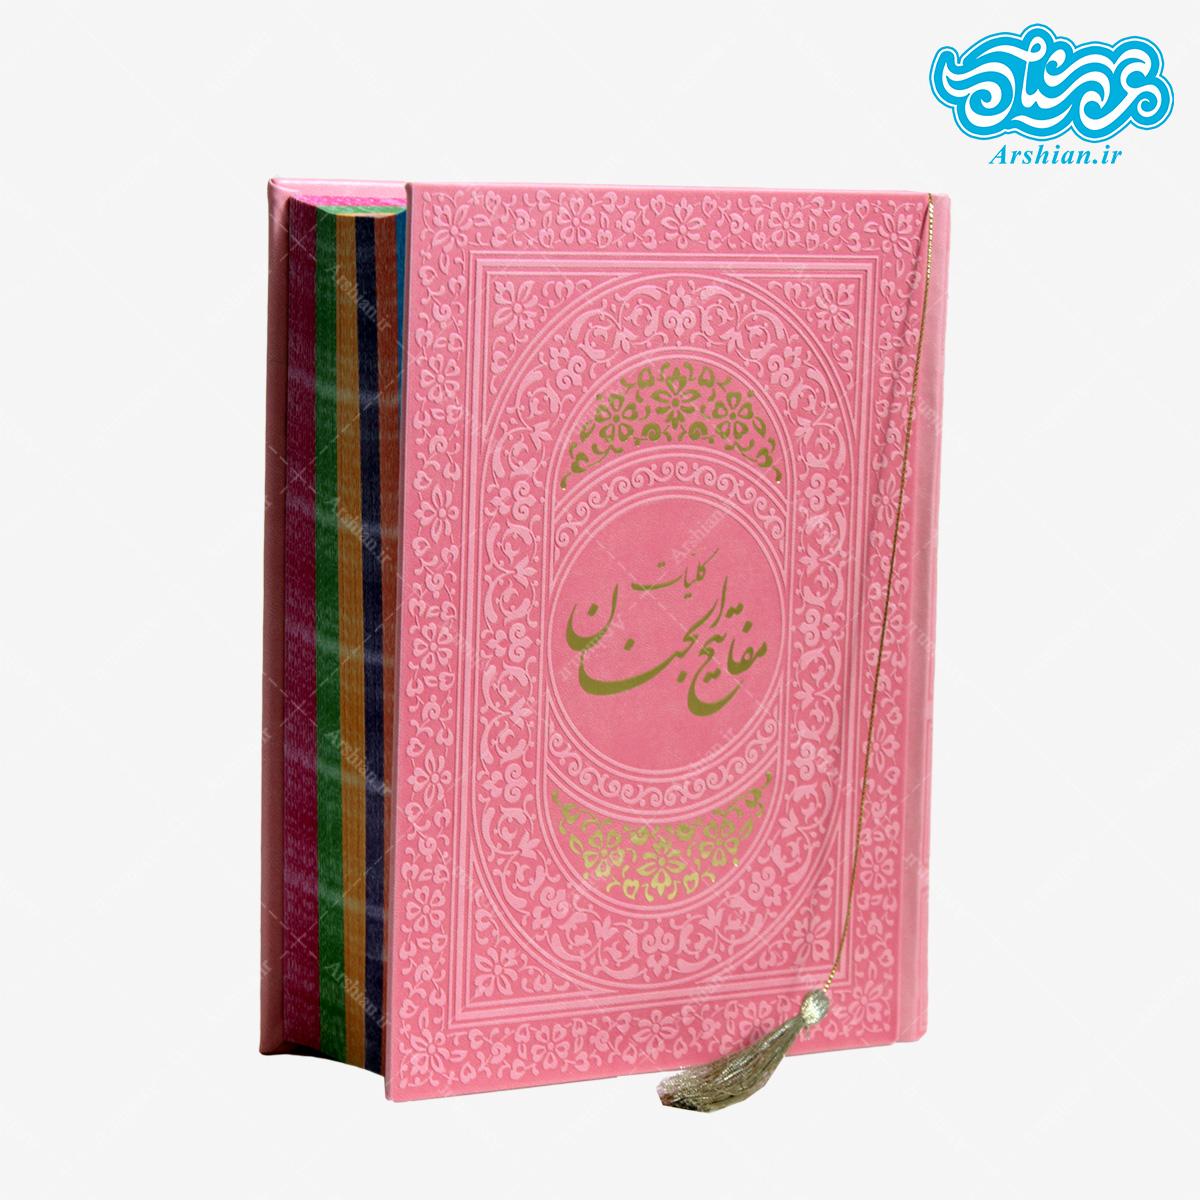 کلیات مفاتیح الجنان رنگی وزیری